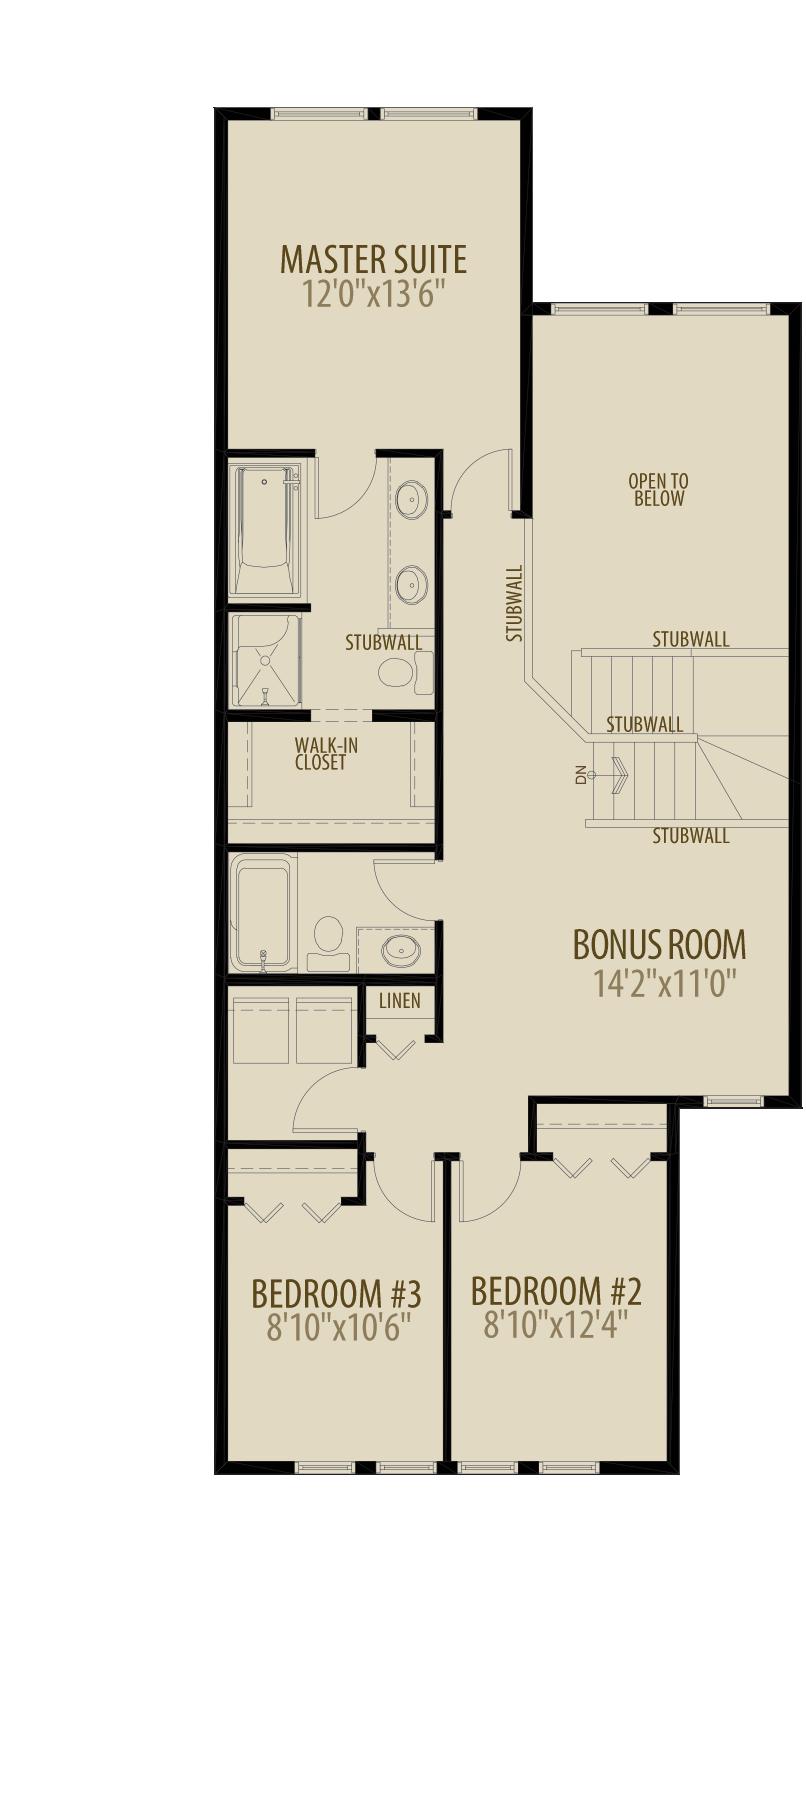 Option 4 Open to Below Bonus Room Removes 85 sq ft